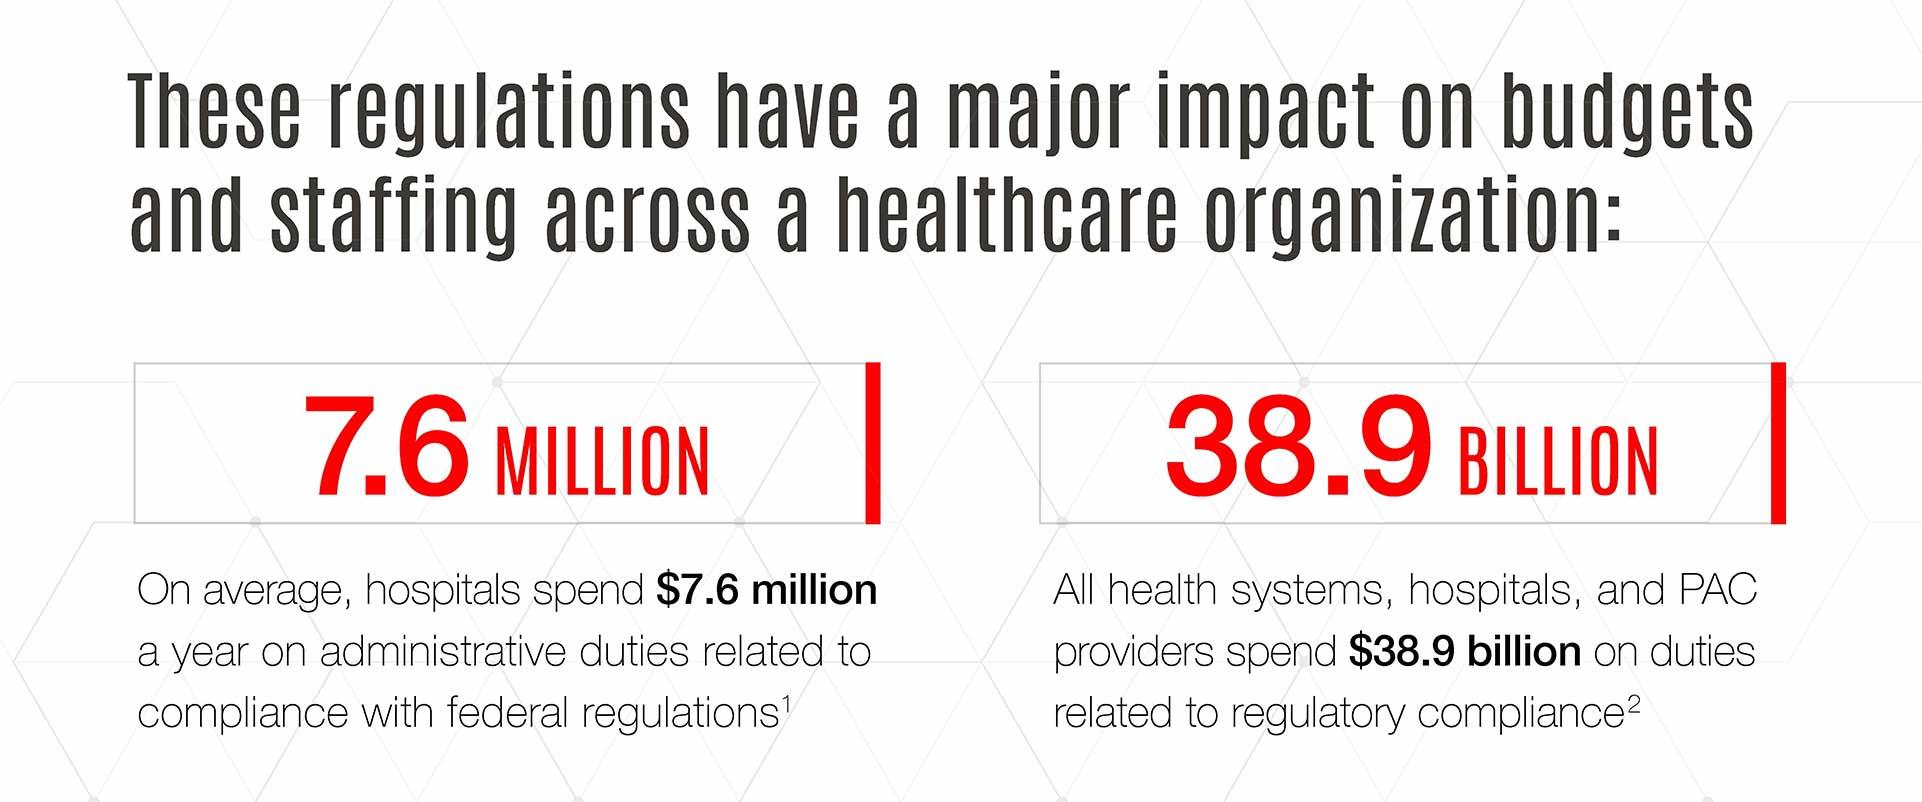 Healthcare regulations impact